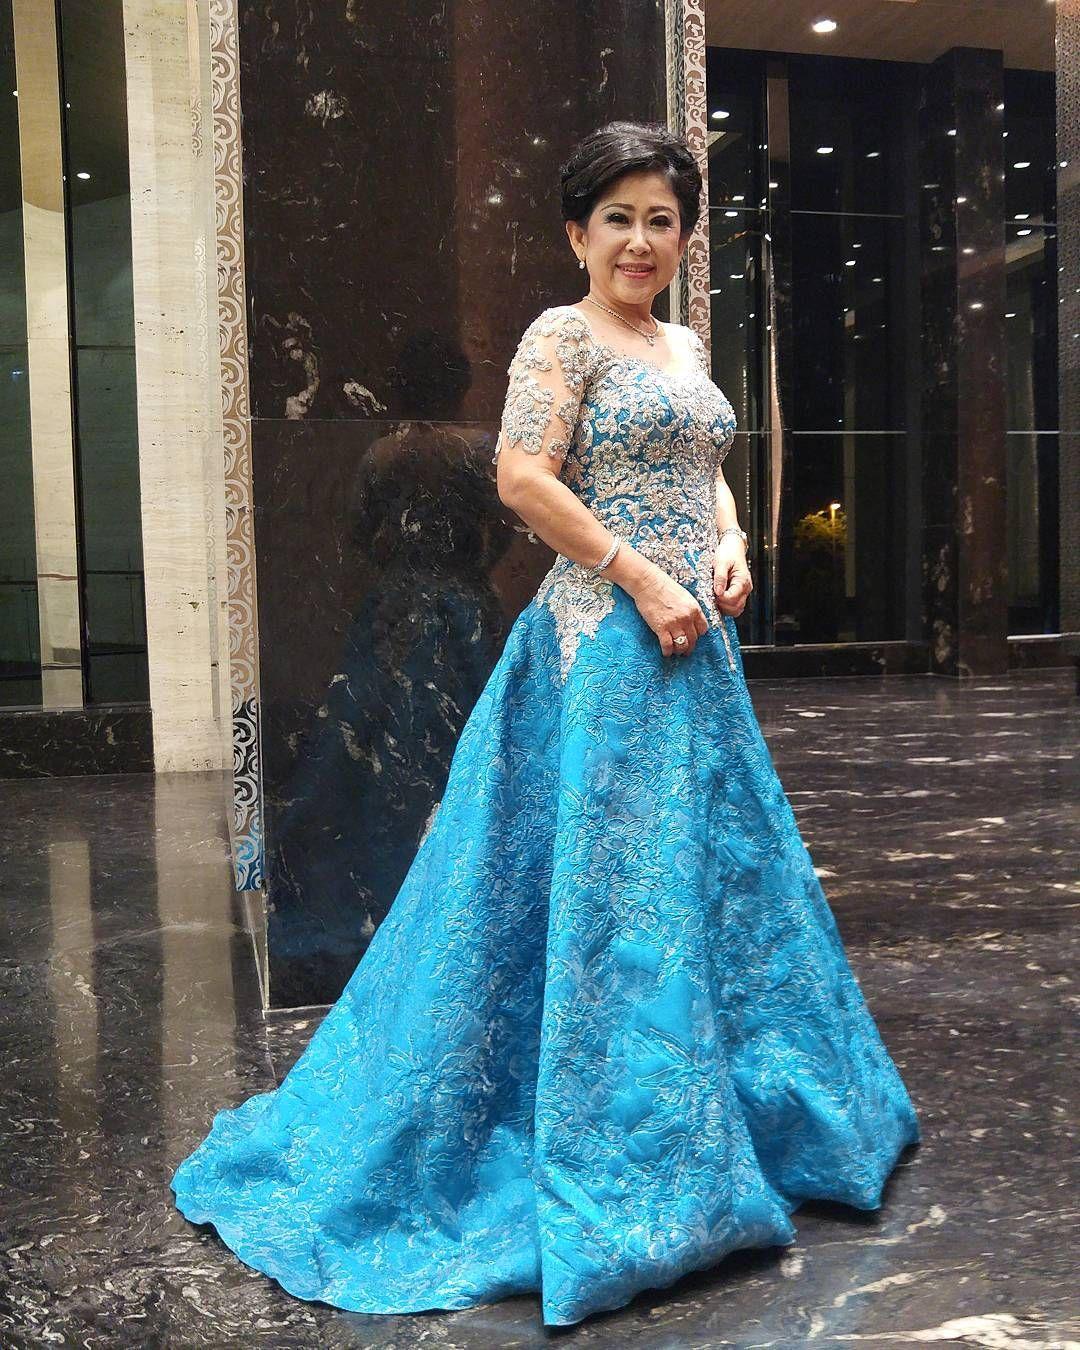 Custom Mother of the Bride Evening Dresses from Darius USA   Ball ...